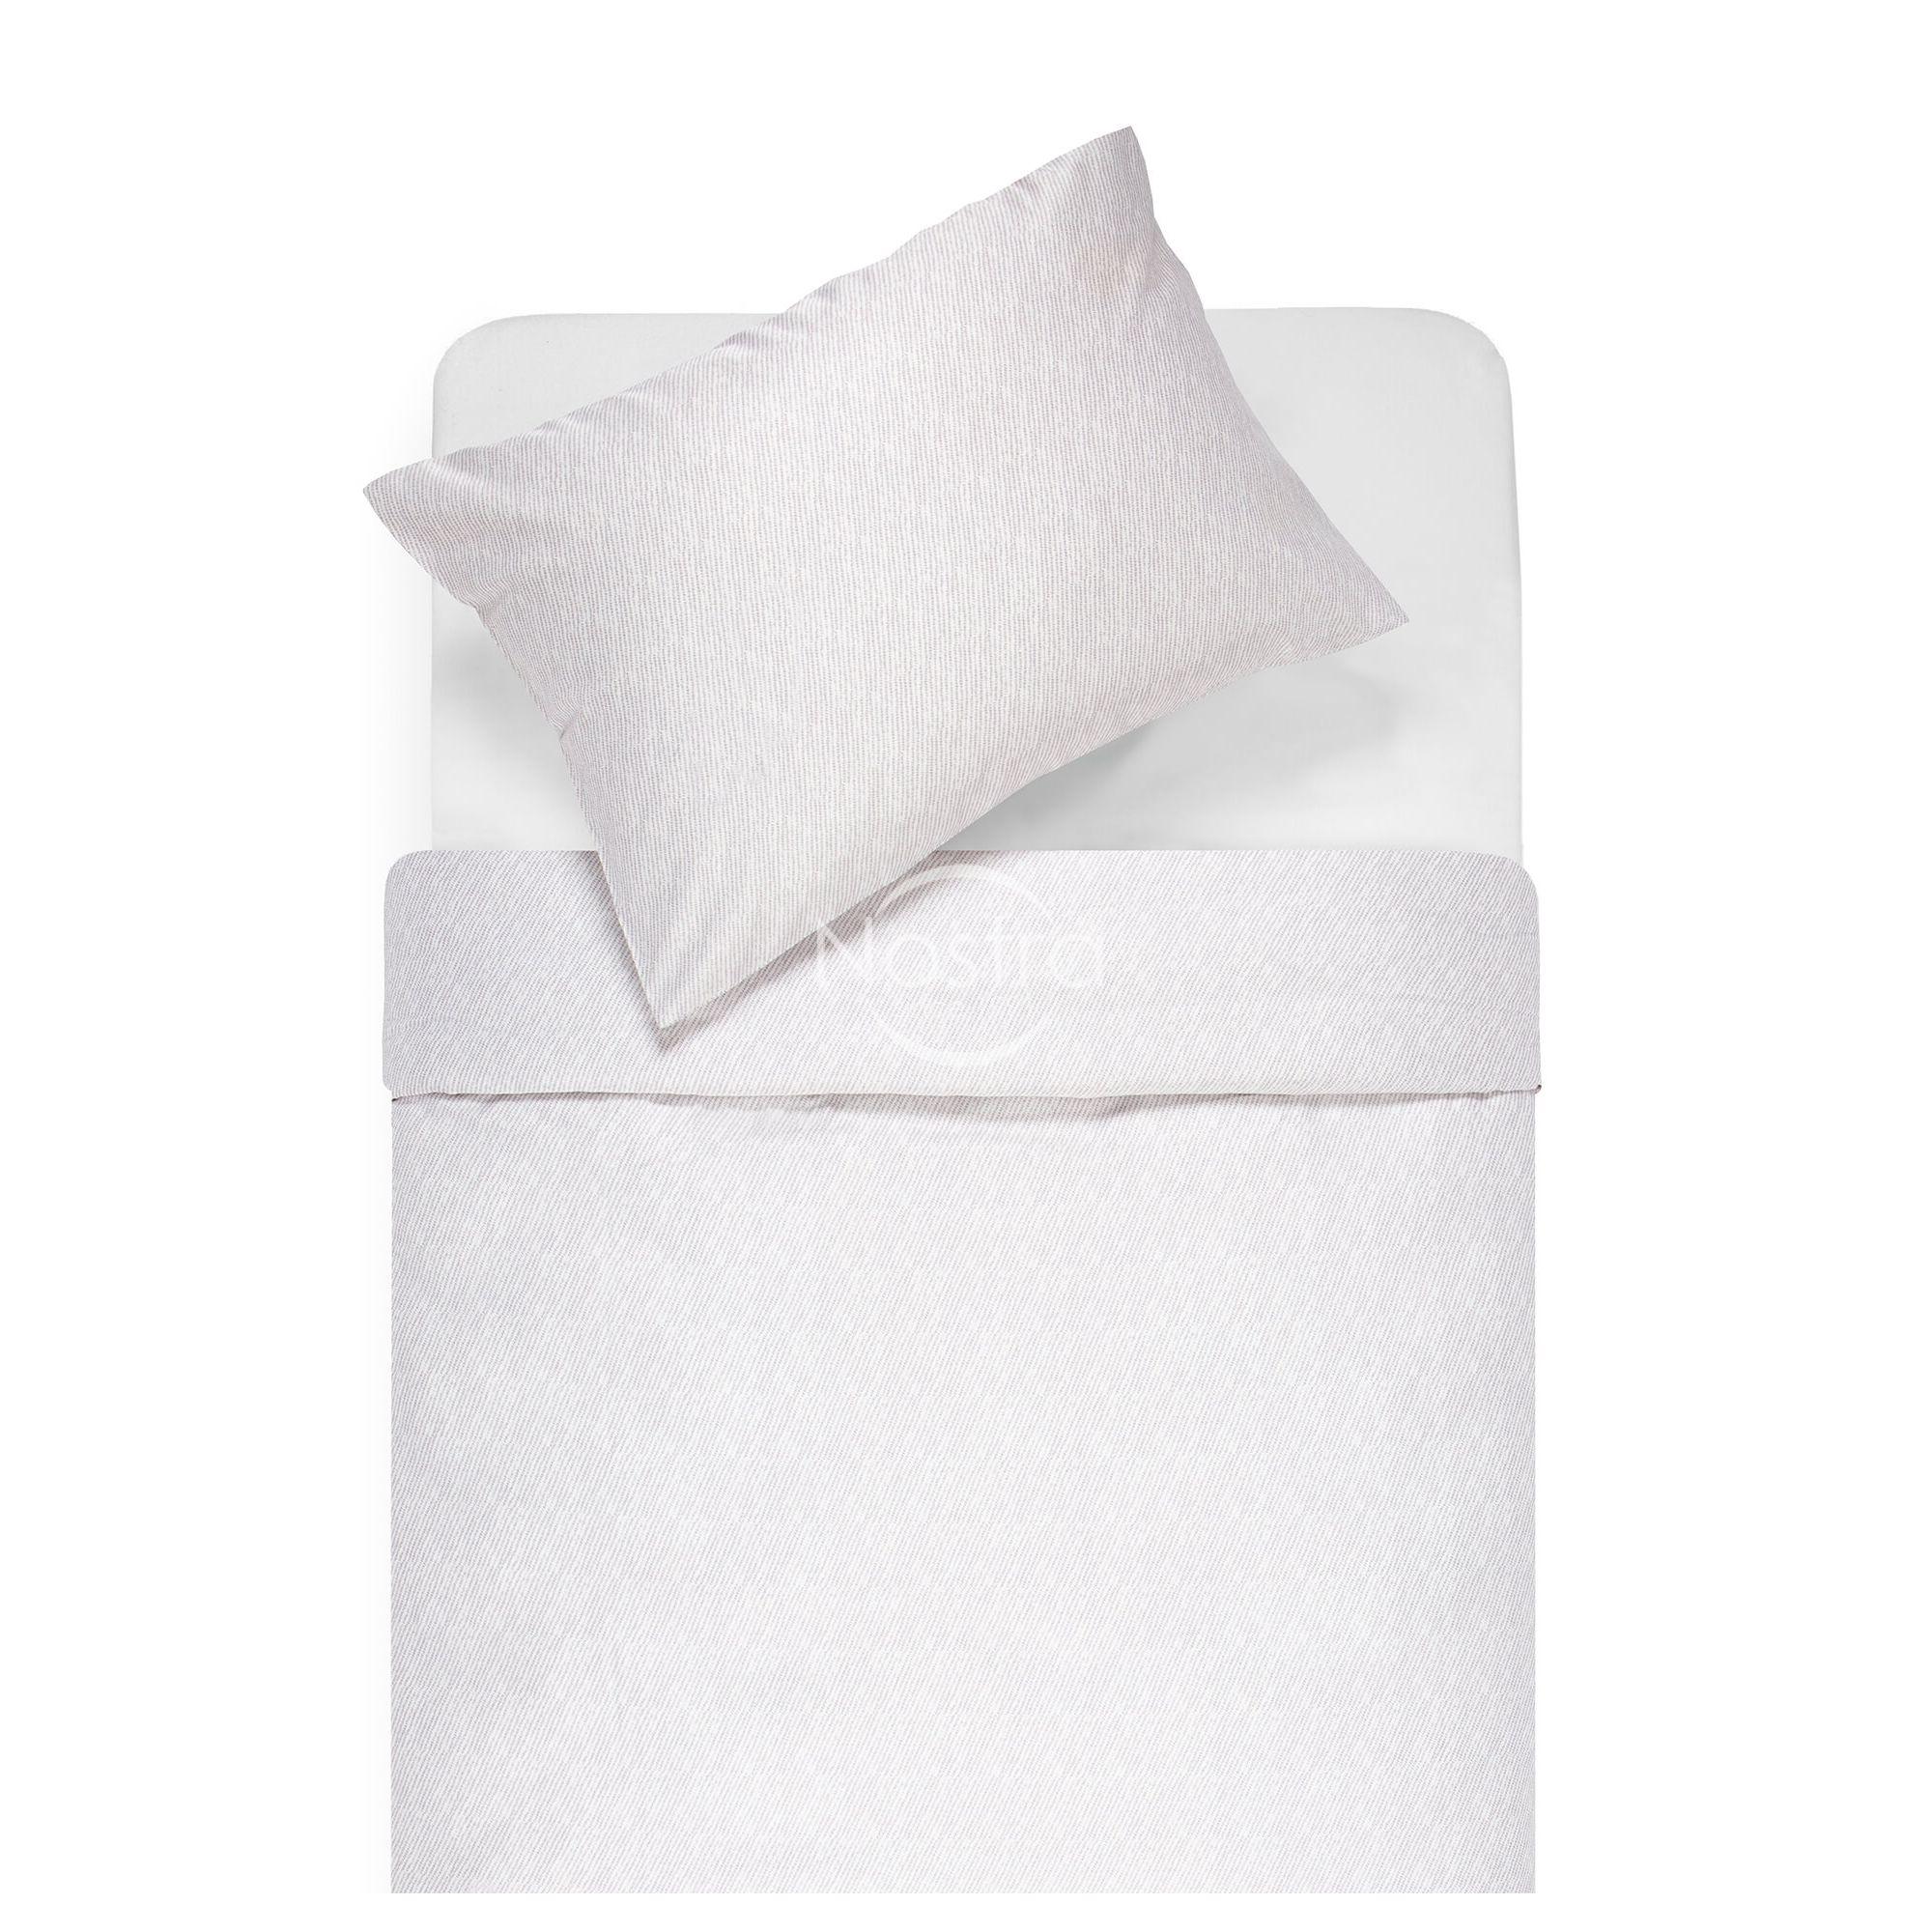 Satīna gultas veļa AGAFIA 40-1179-L.GREY